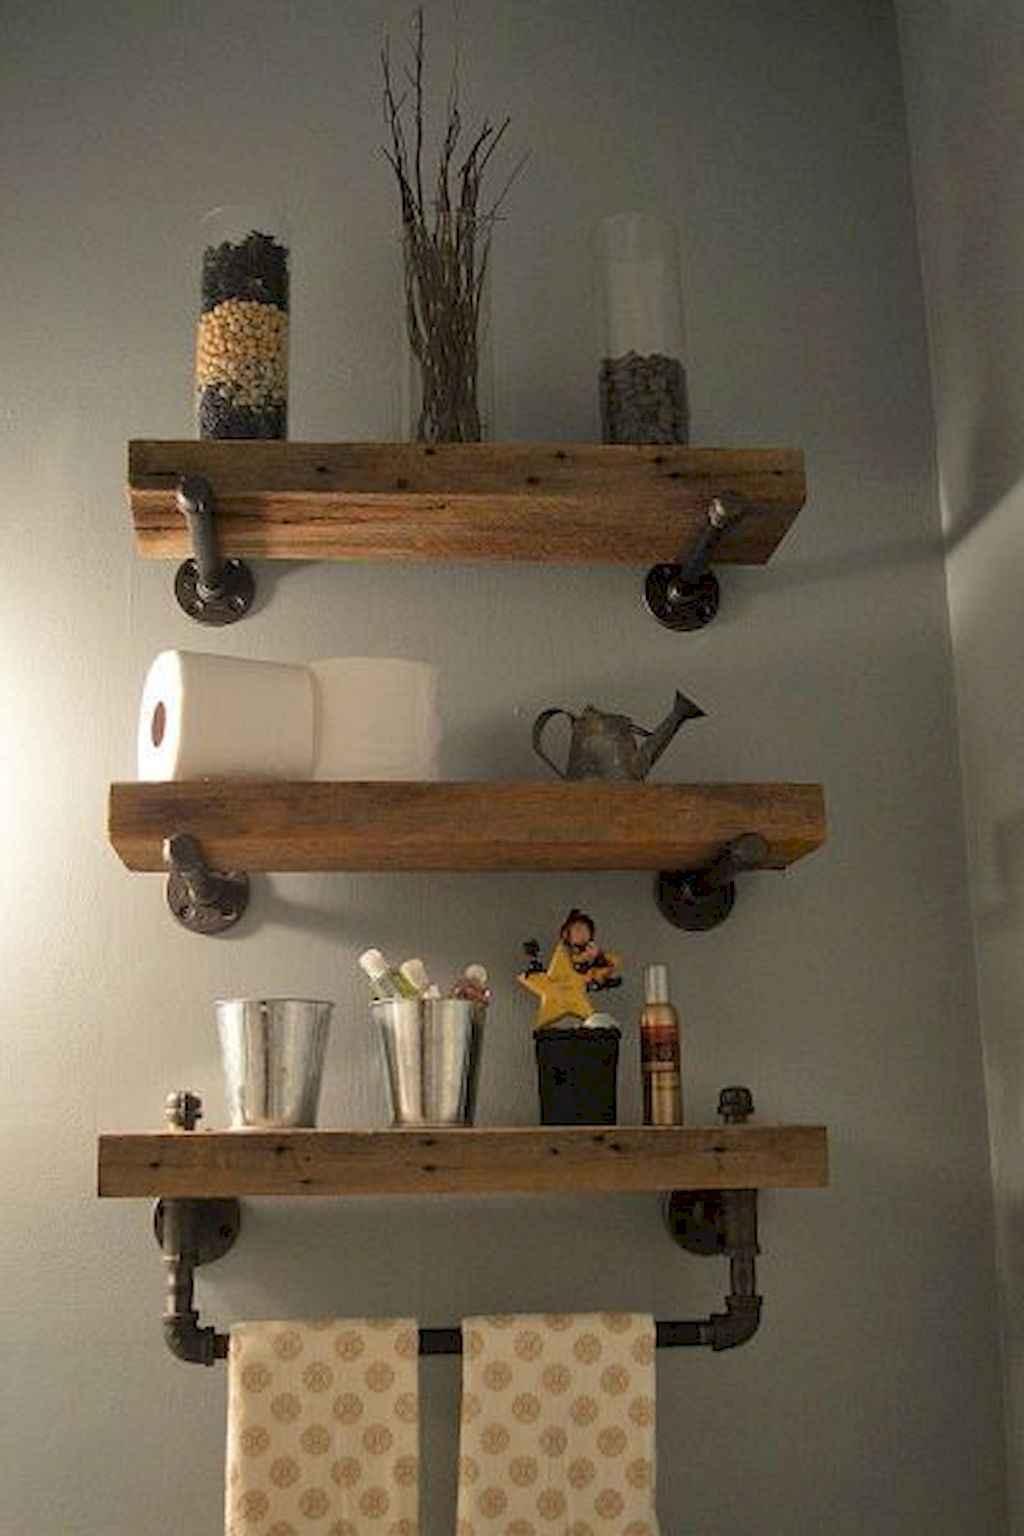 111 Brilliant Small Bathroom Remodel Ideas On A Budget (71)